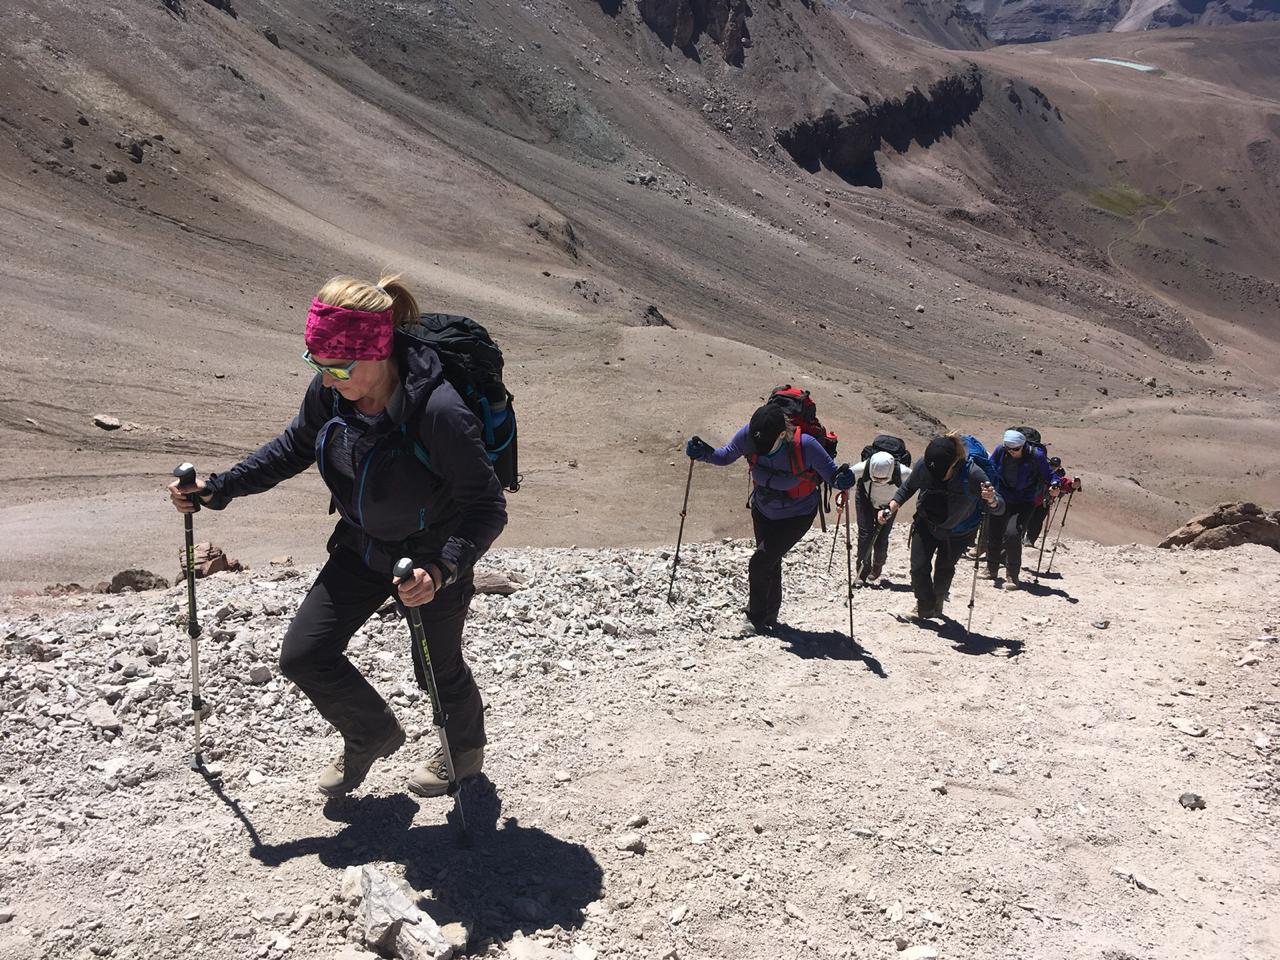 Ojos-del-Salado-Expedition-Forces-Wives-Challenge.jpg